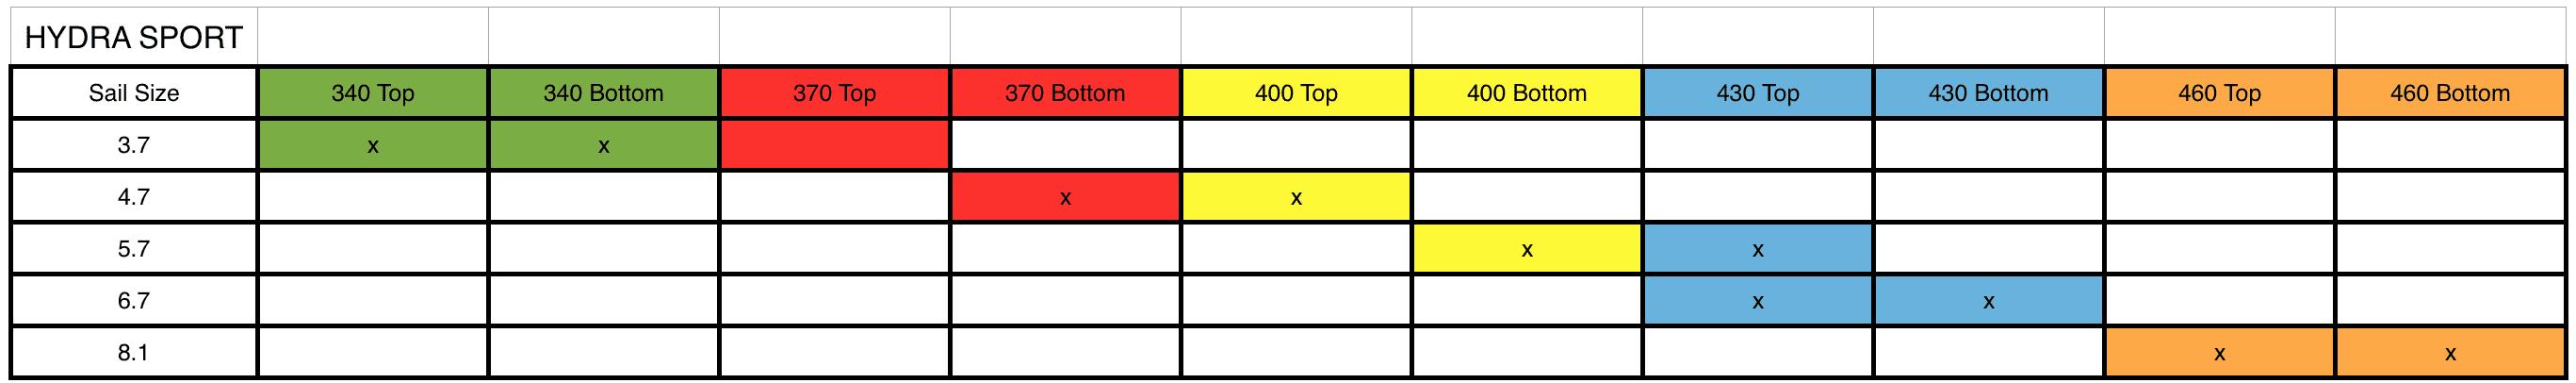 Hydra Mast Chart